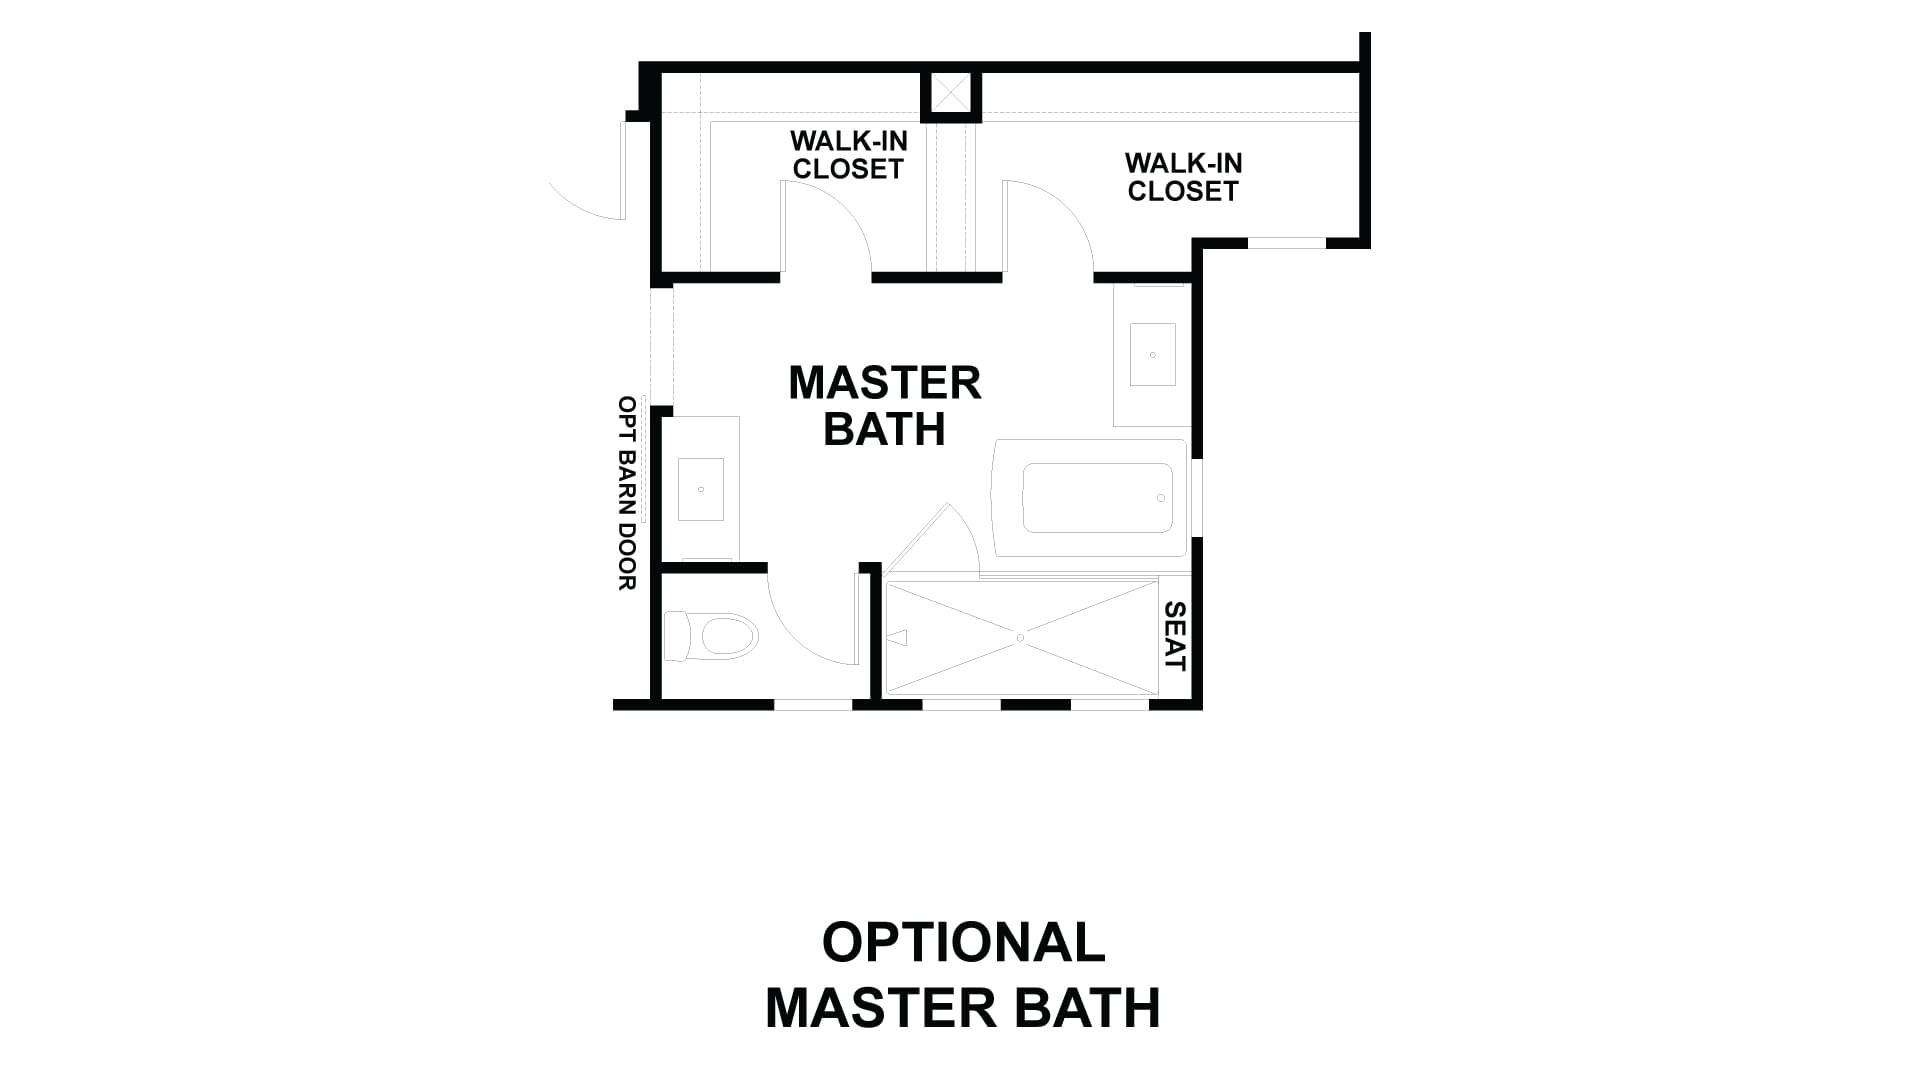 Optional Tub at Master Bath. 2,169sf New Home in Costa Mesa, CA